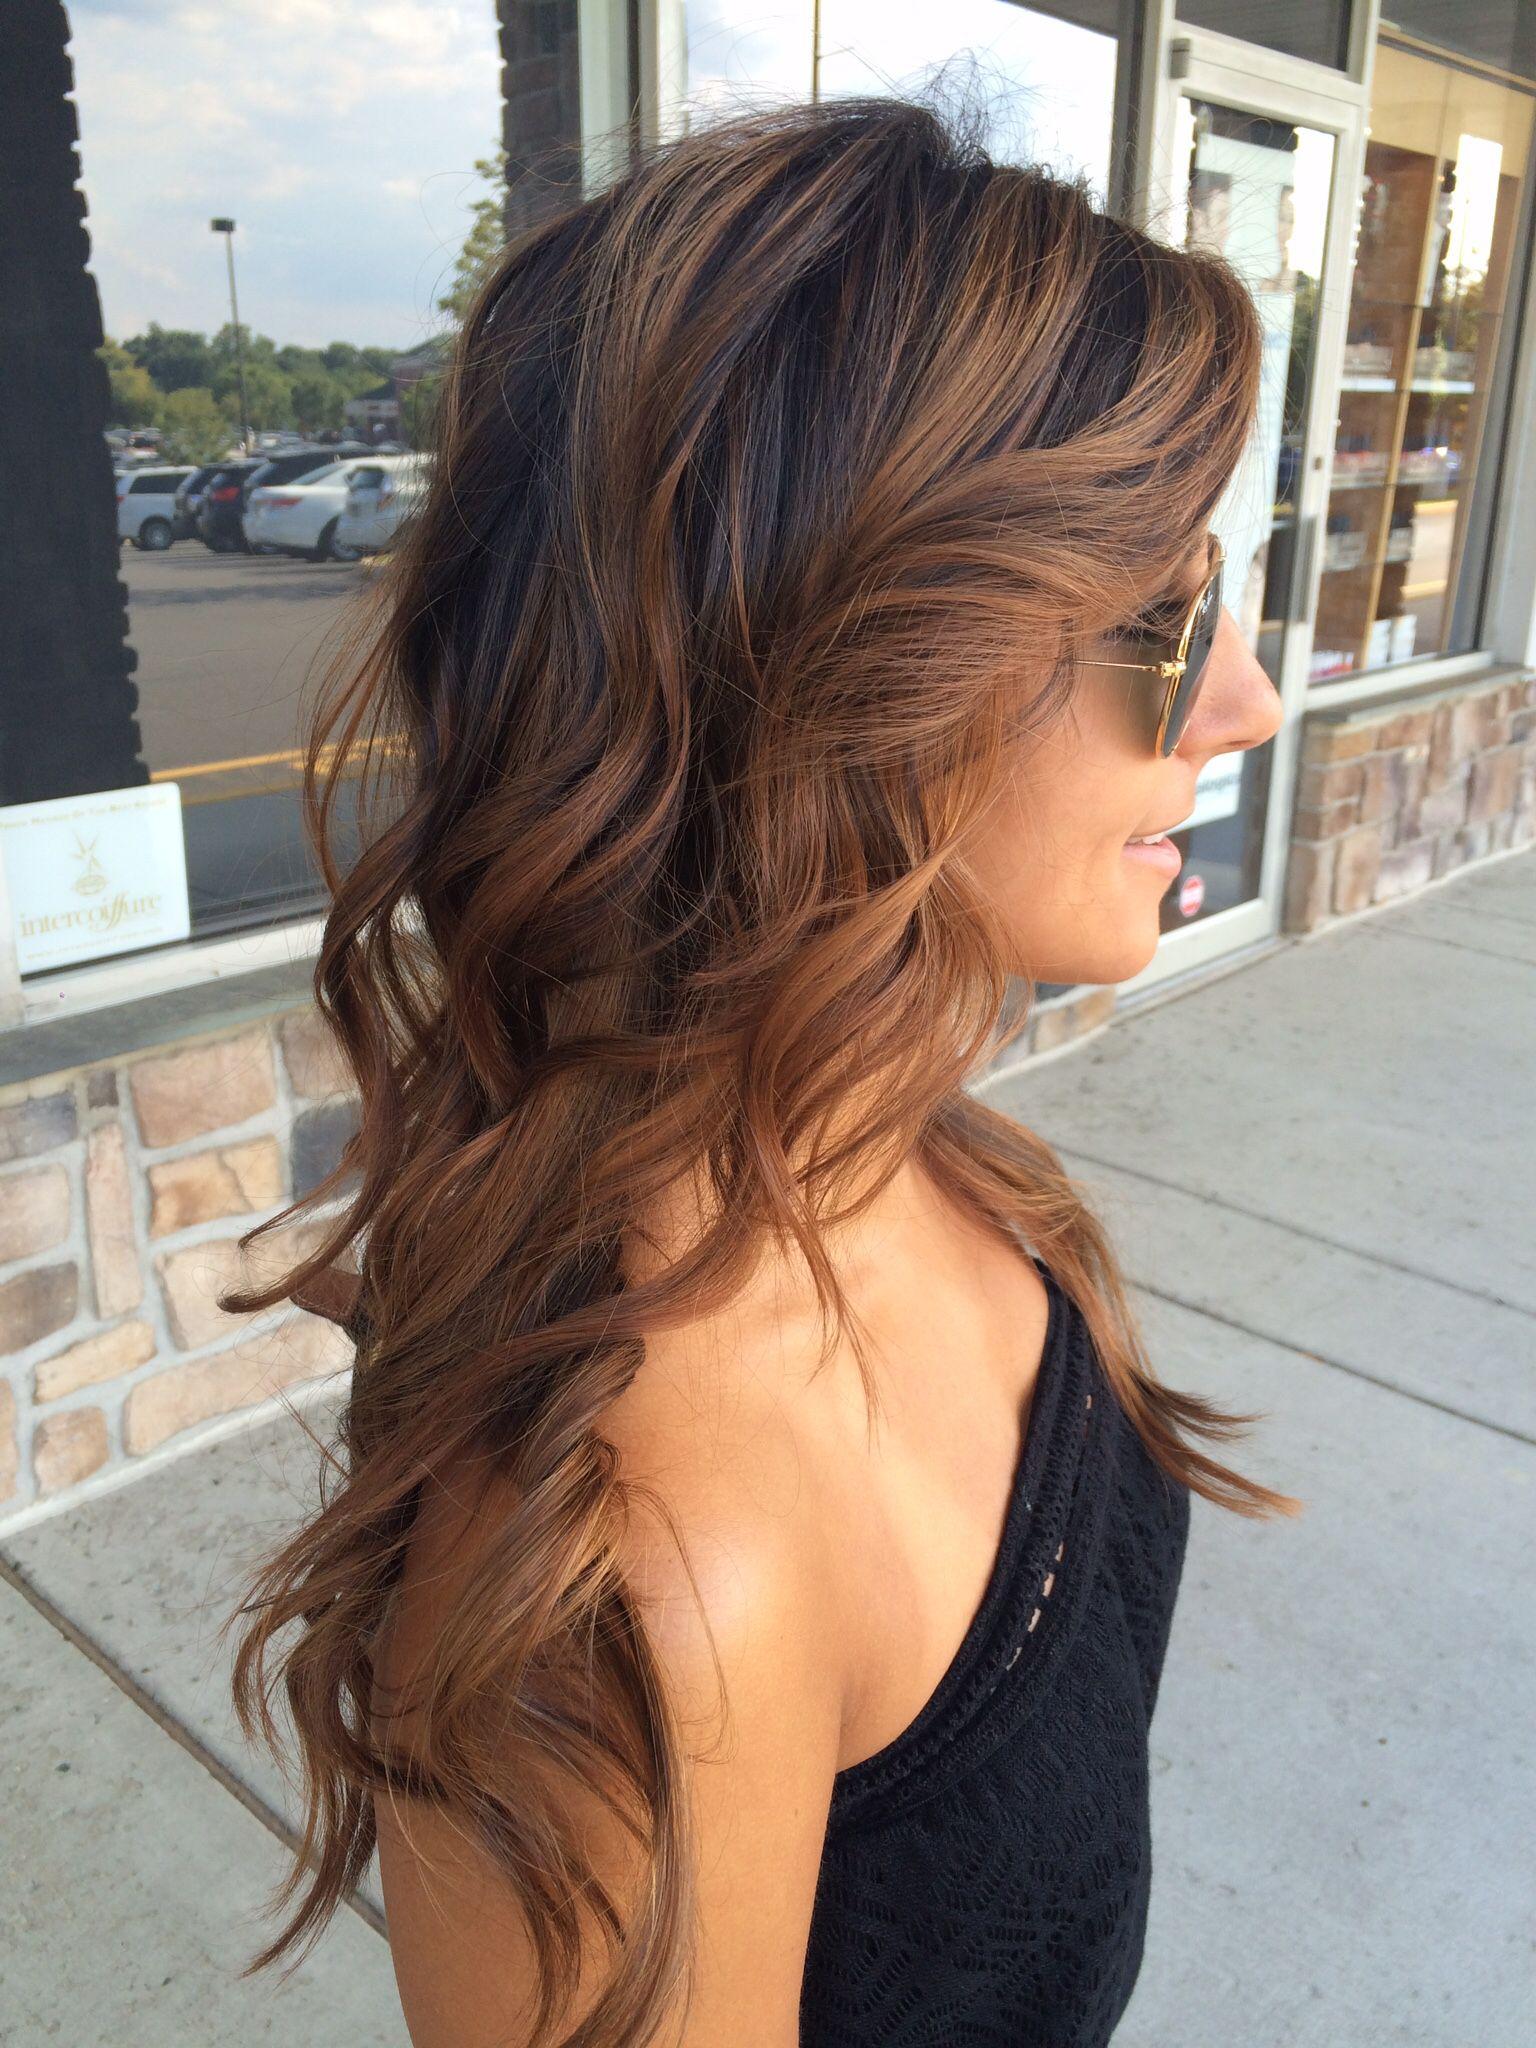 Ballayage Blond destiné pinterest: taylor_kagel | | hair | | pinterest | brown balayage